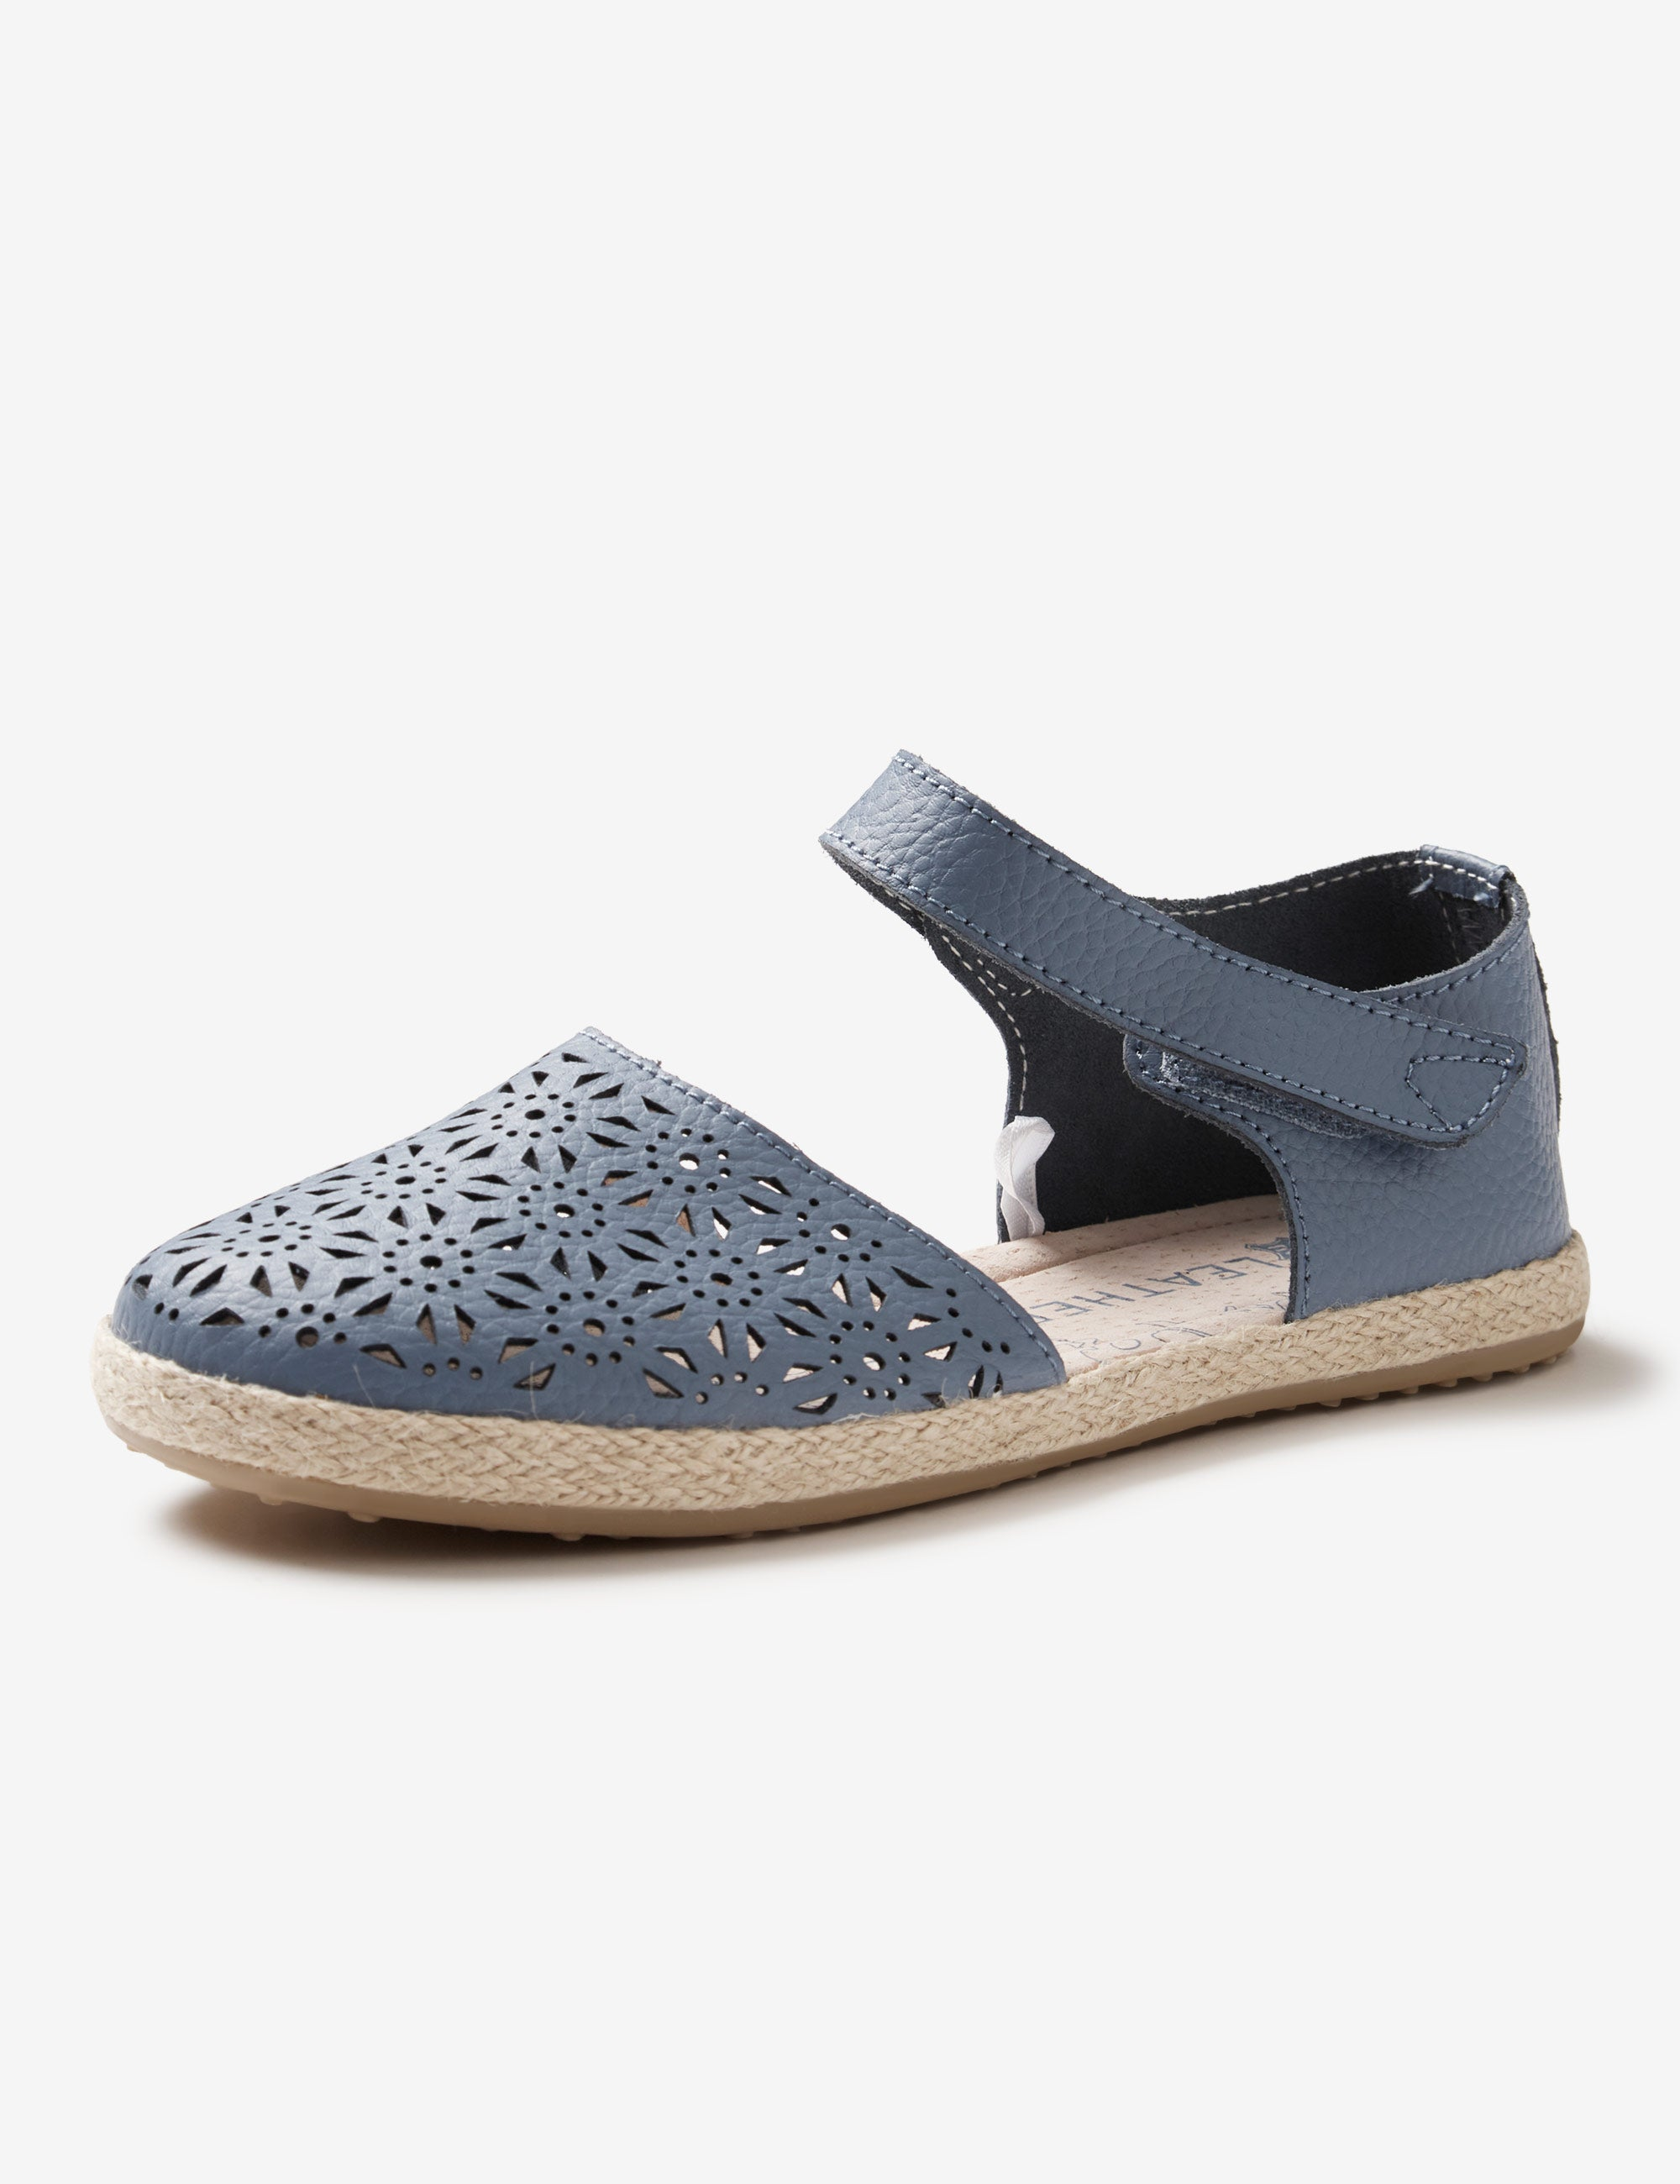 Women's Casual Shoes | Rivers Australia